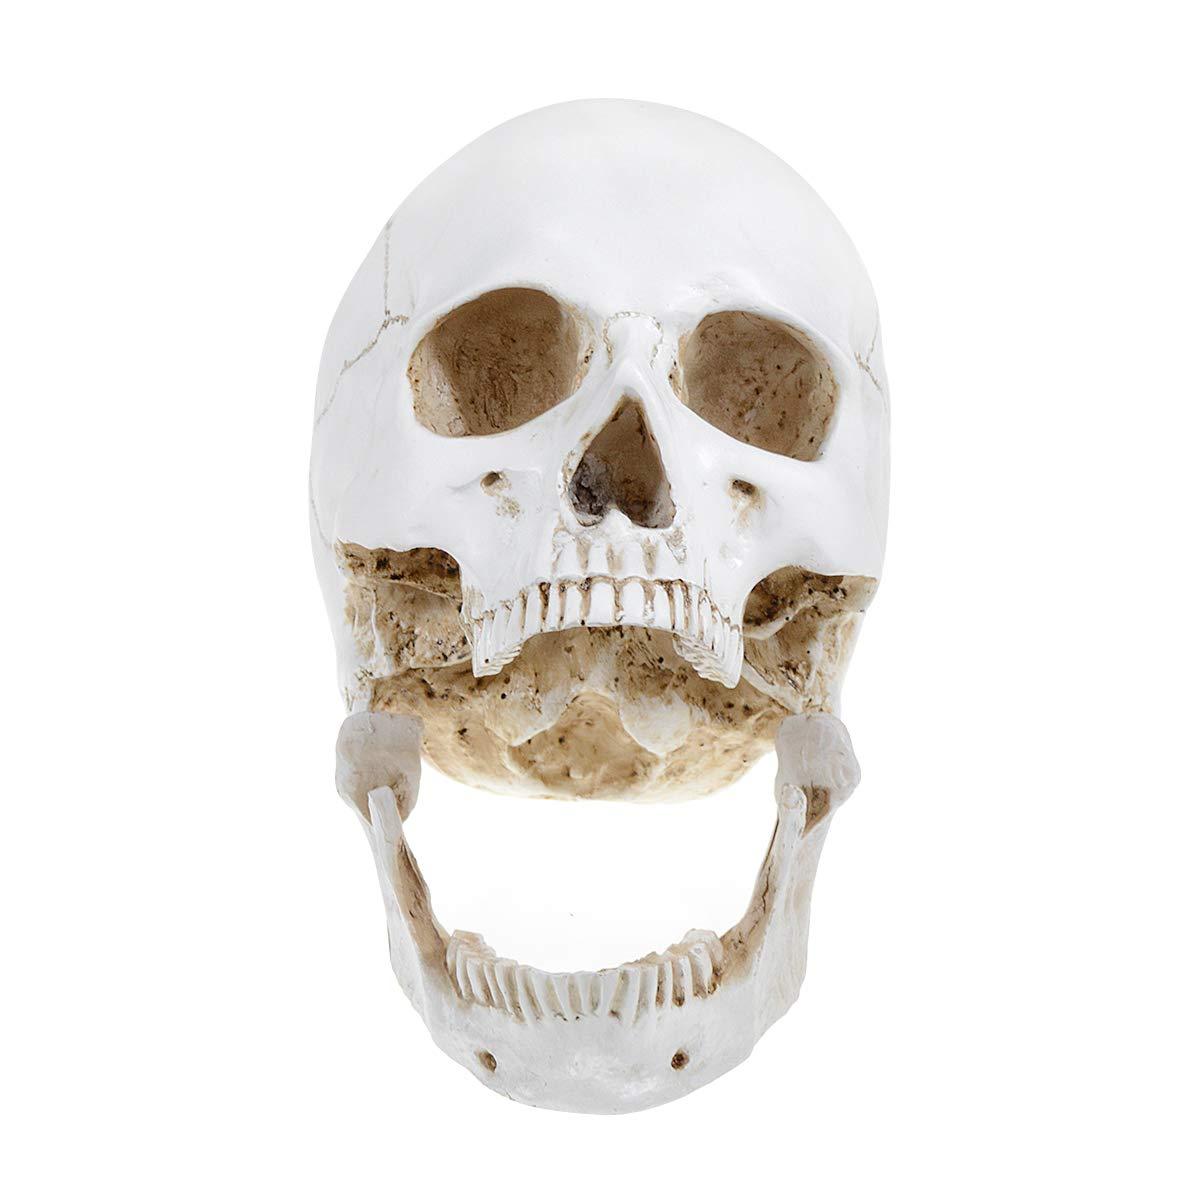 Alkita 1:1 Human Skull Model Life Size Anatomical Medical Teaching Skeleton Head 221517cm Study Model